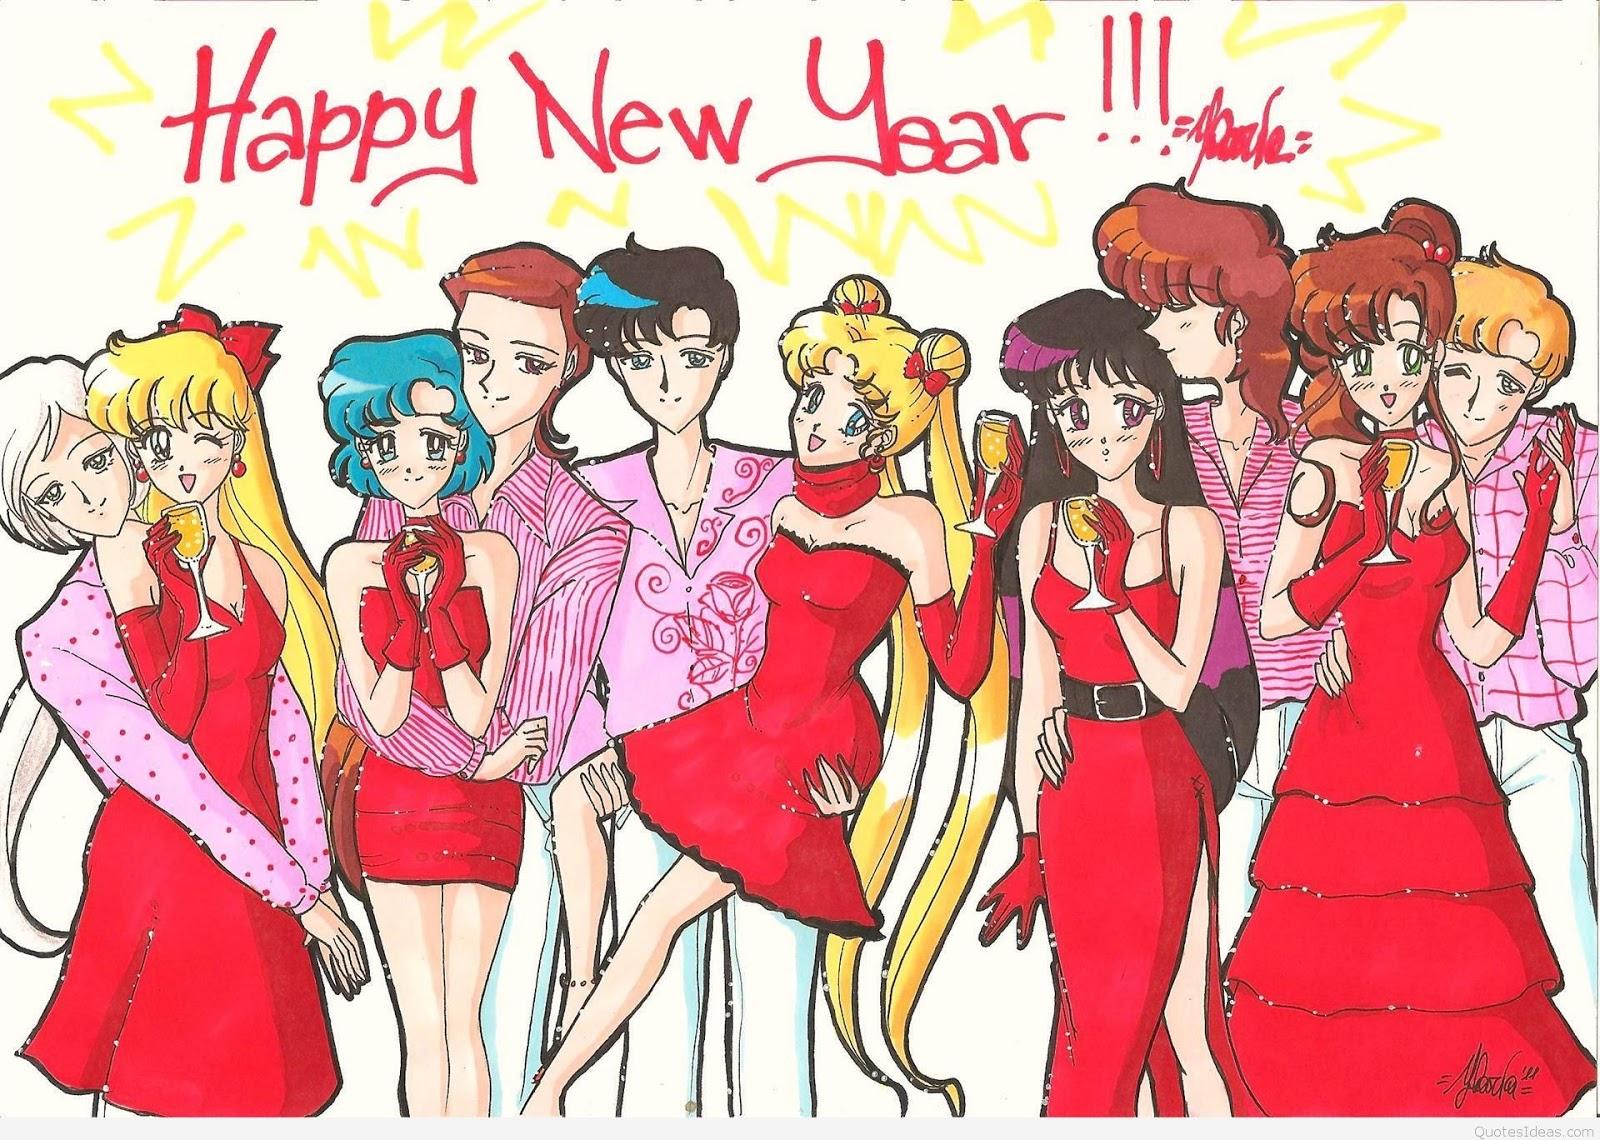 Happy New Year 2017 Cartoon Images | Happy New Year 2017